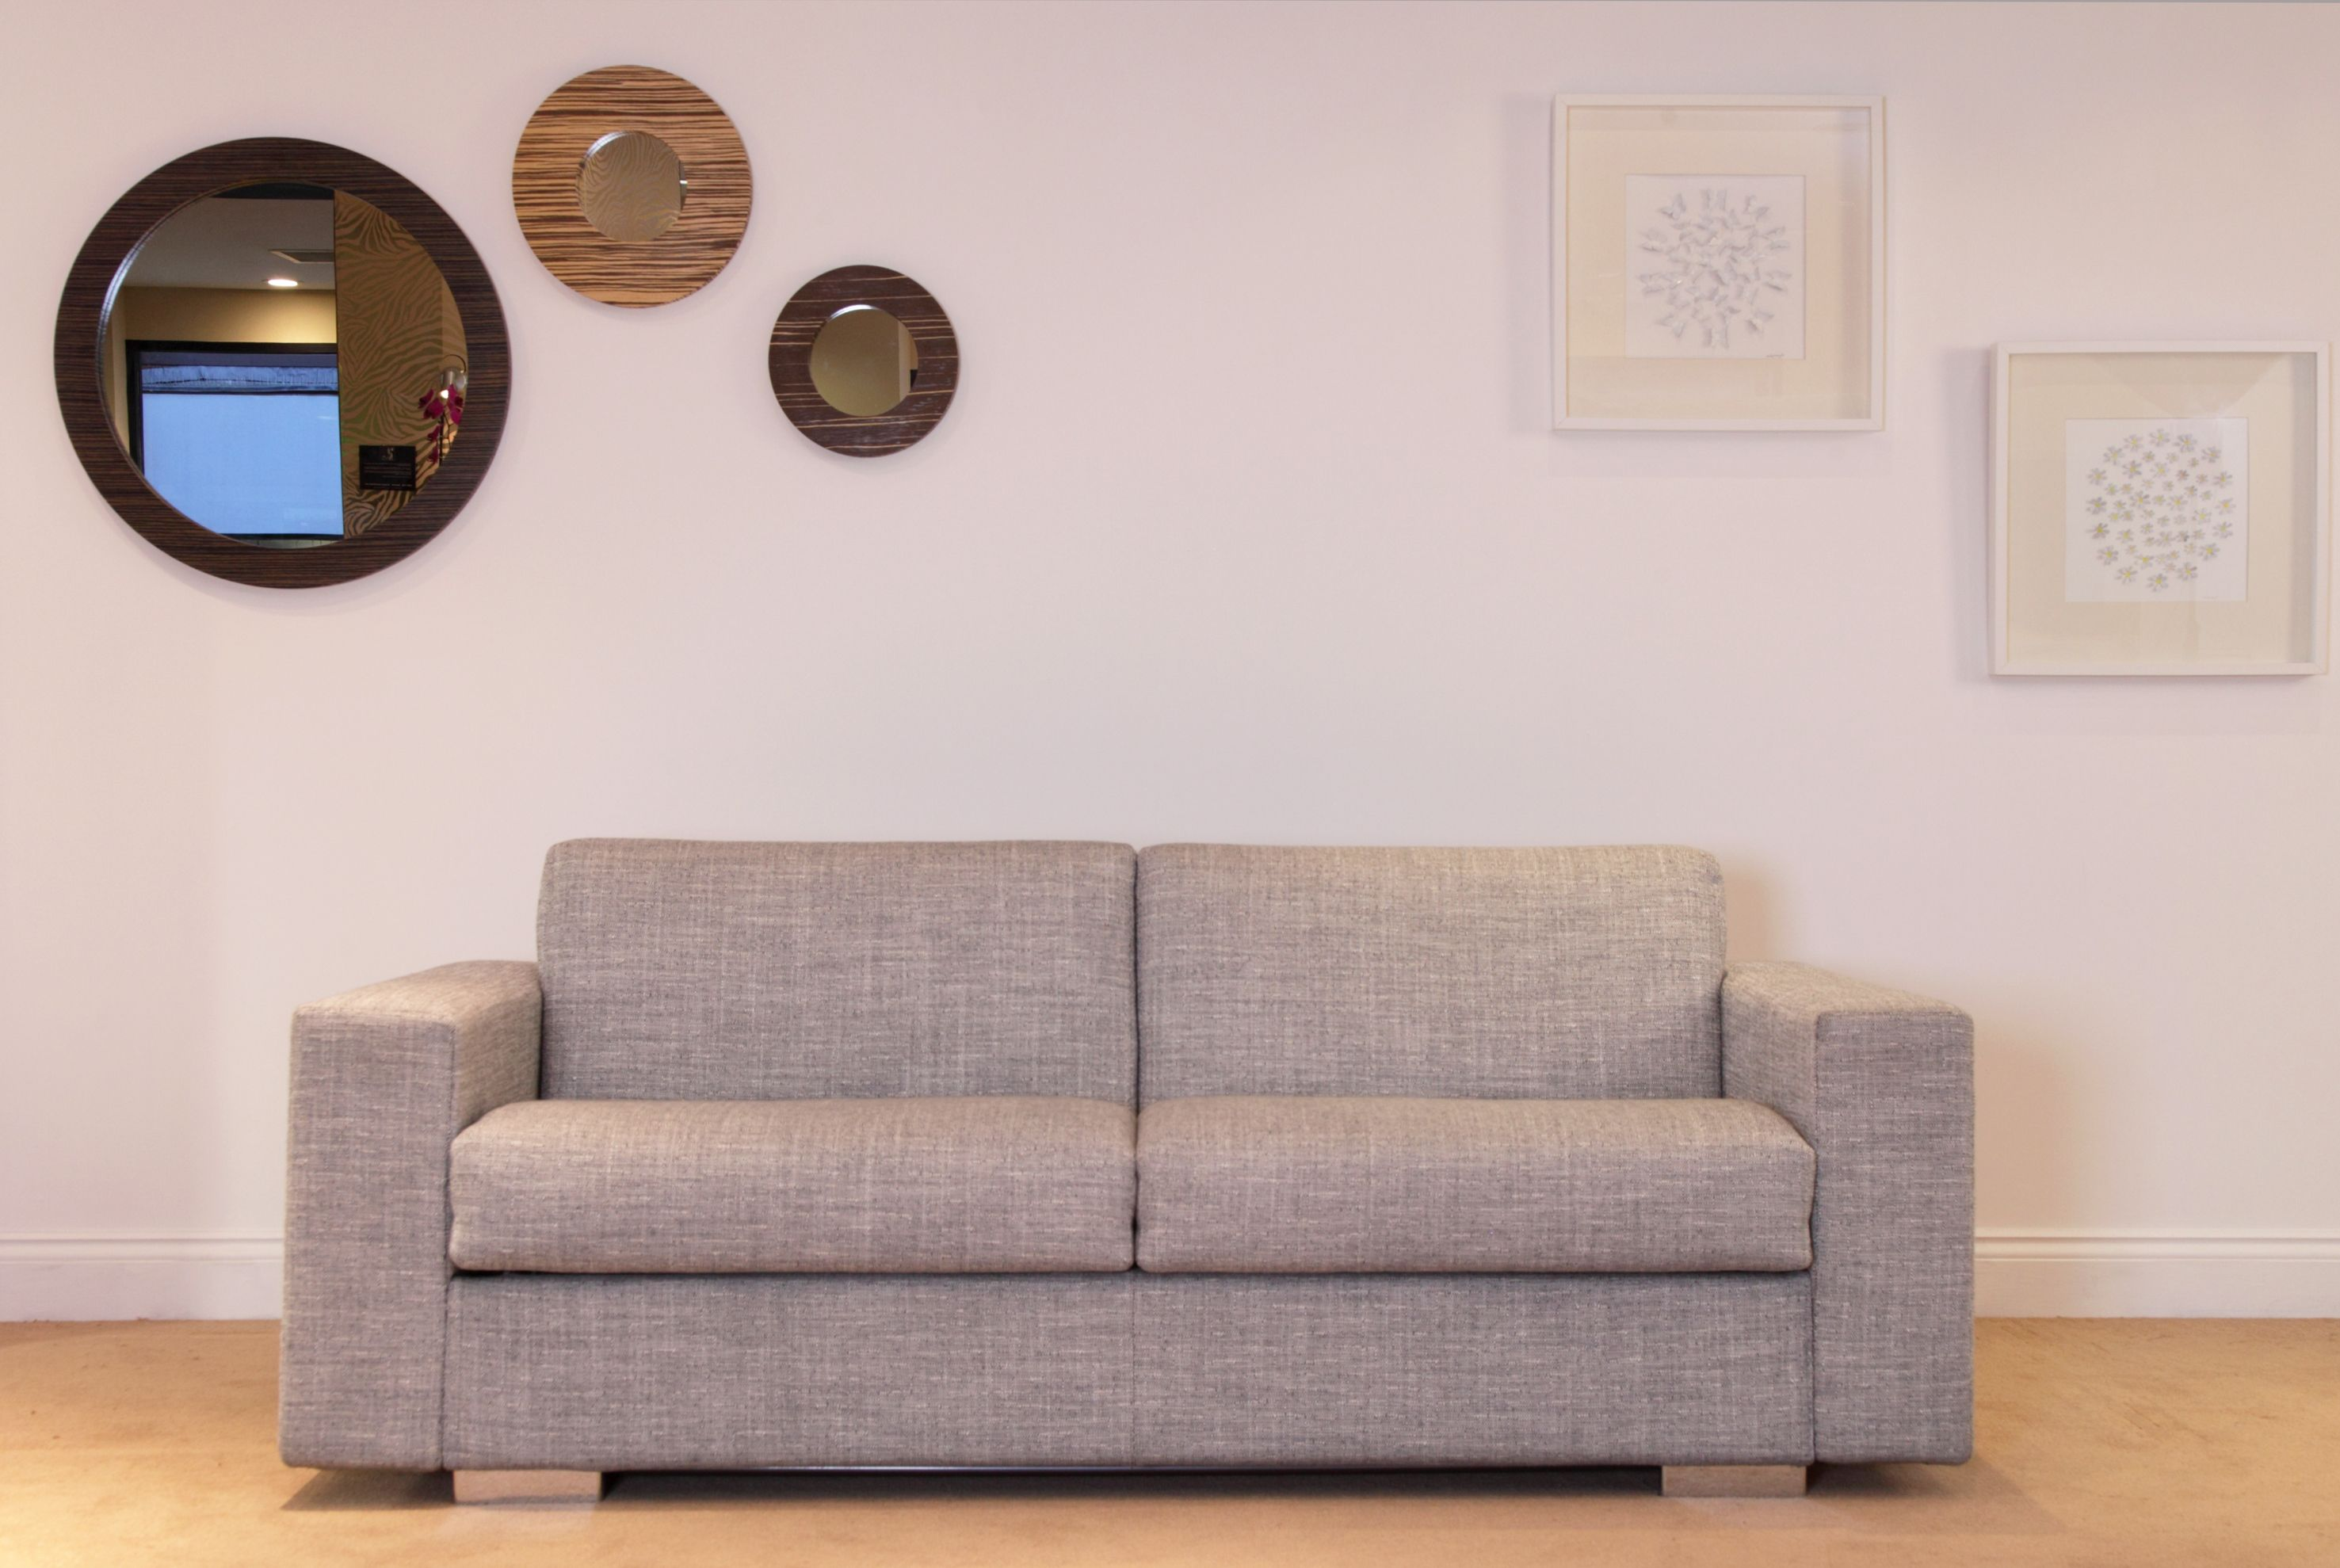 204 cm wide x 100 cm deep x 81 cm high sofa. Firm foam